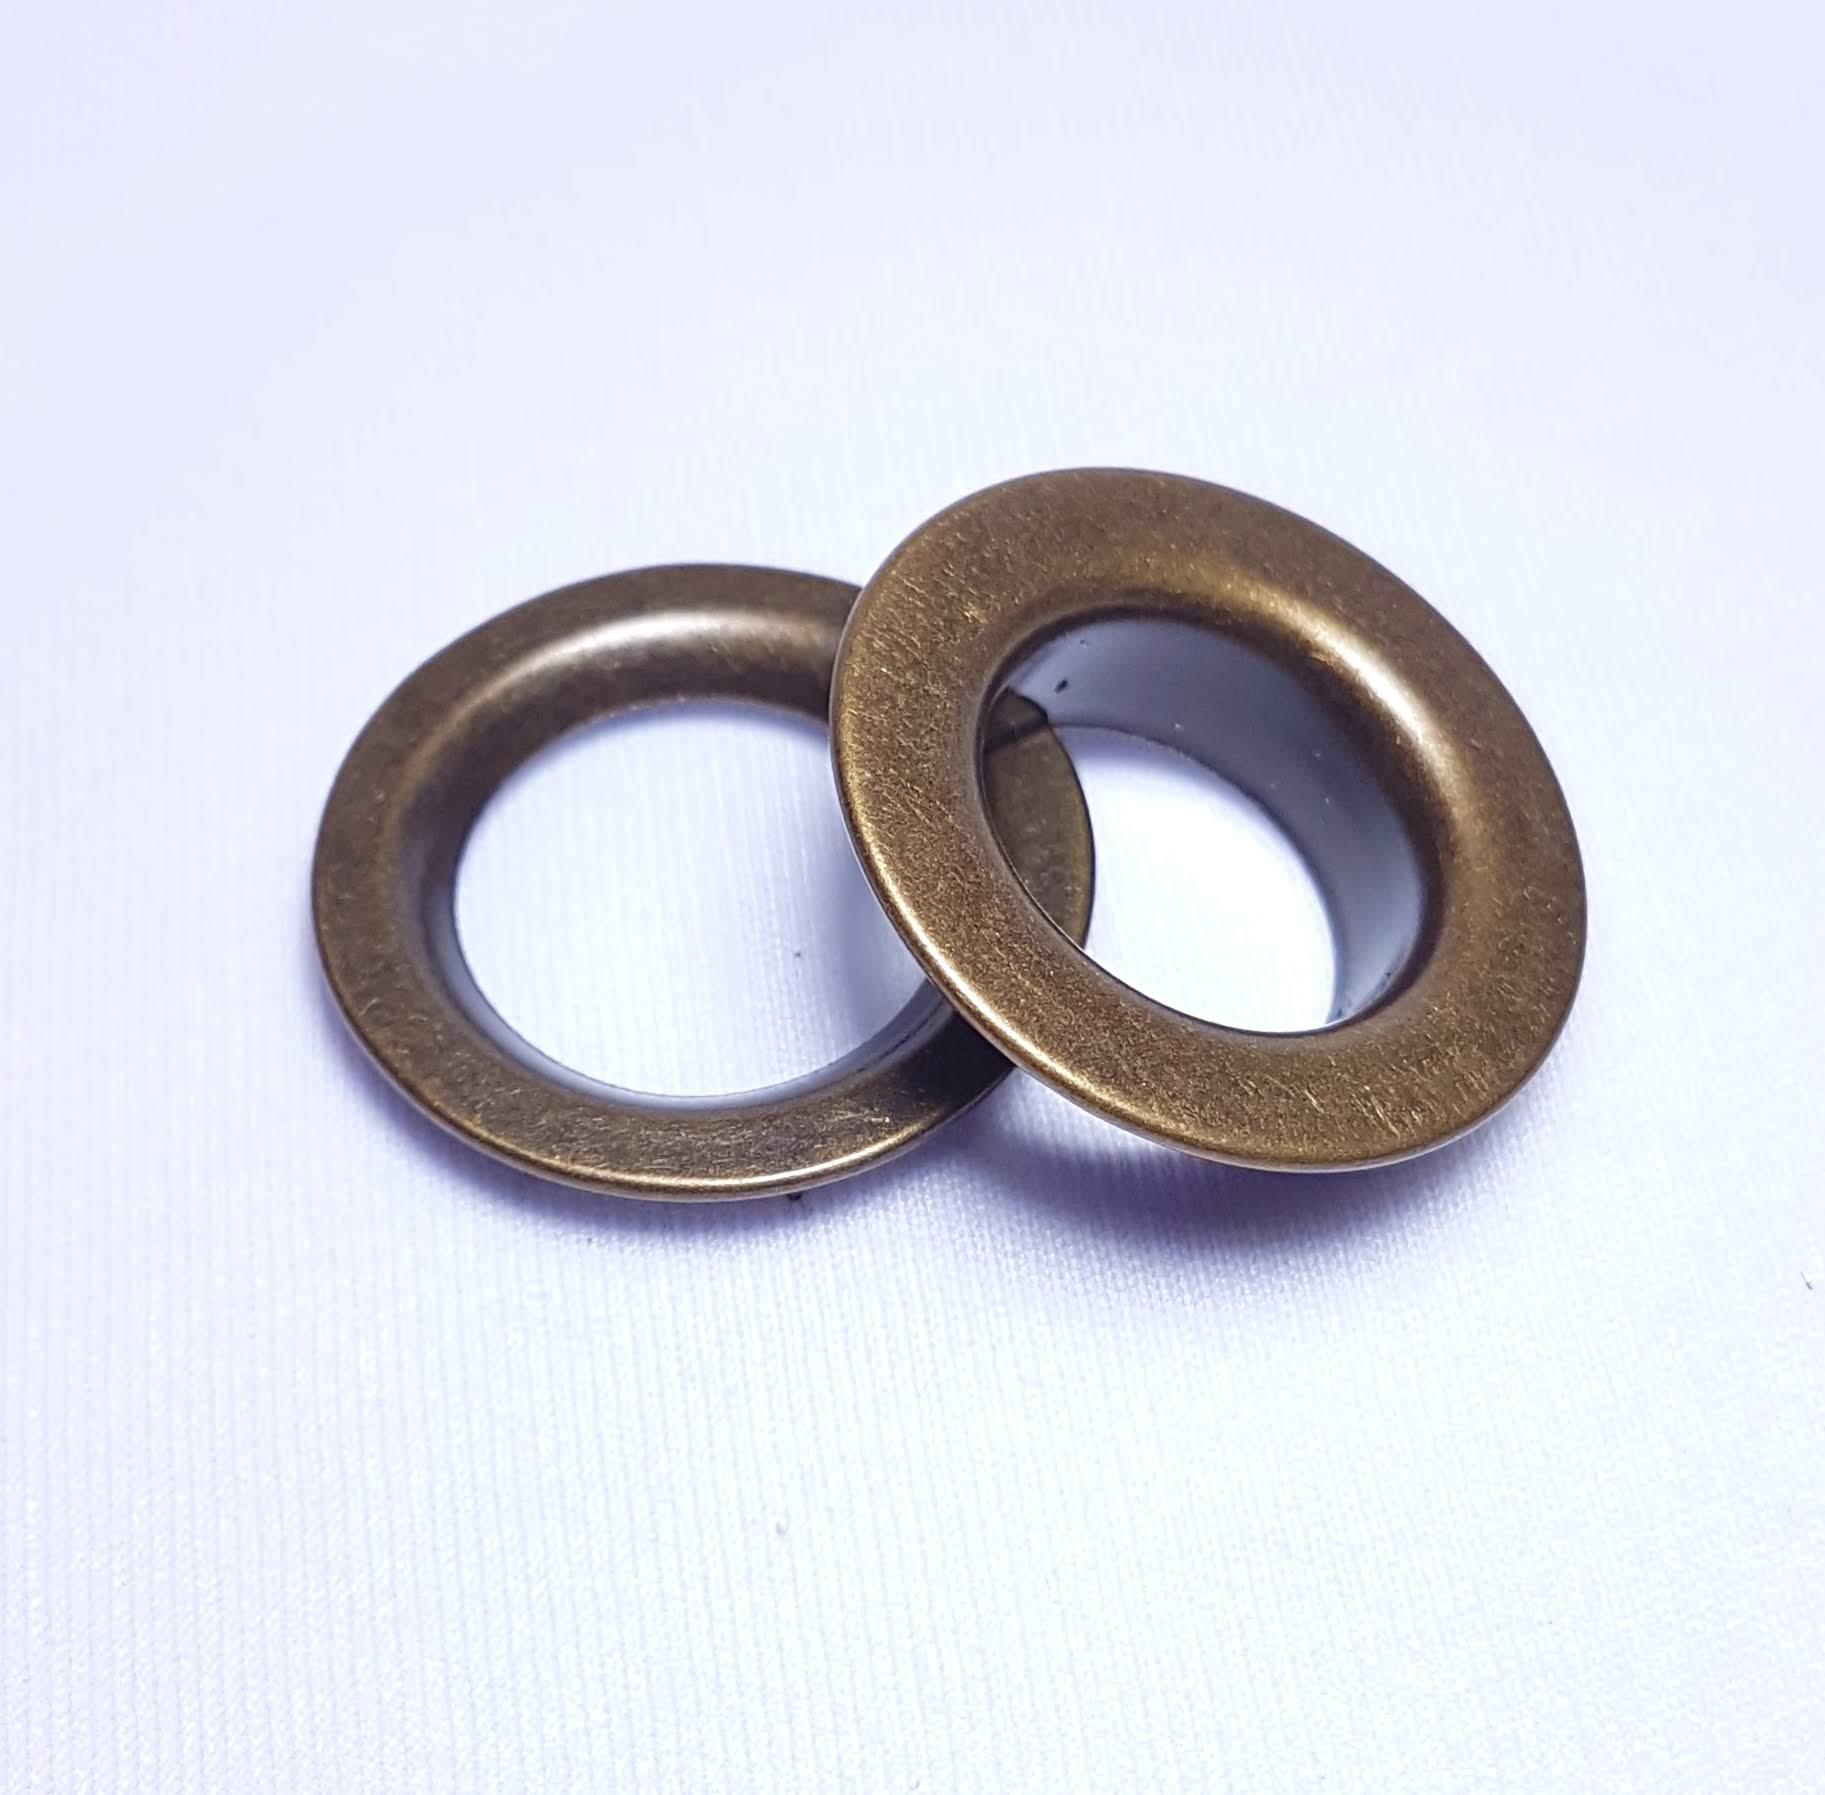 Ilhós de ferro arruela com garra n.º 4 - Ouro Velho - Pcte c/ 10 unid